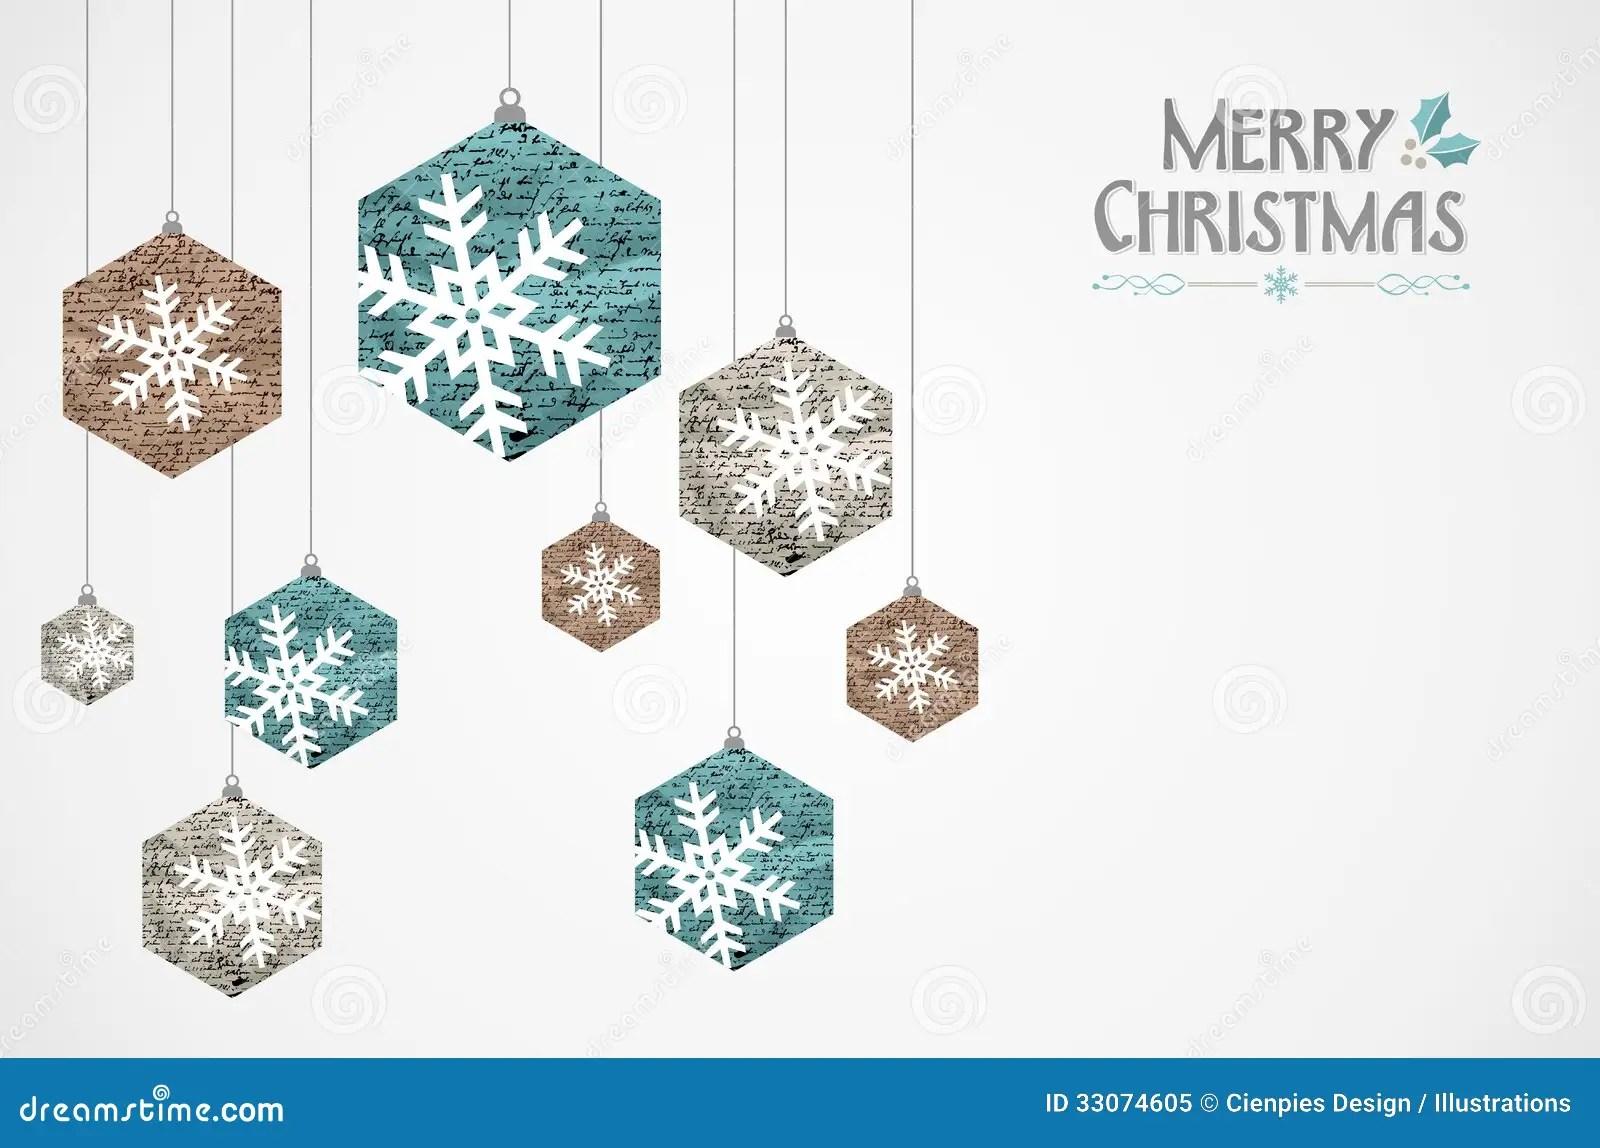 Merry Christmas Vintage Snowflakes Grunge Postcard Stock